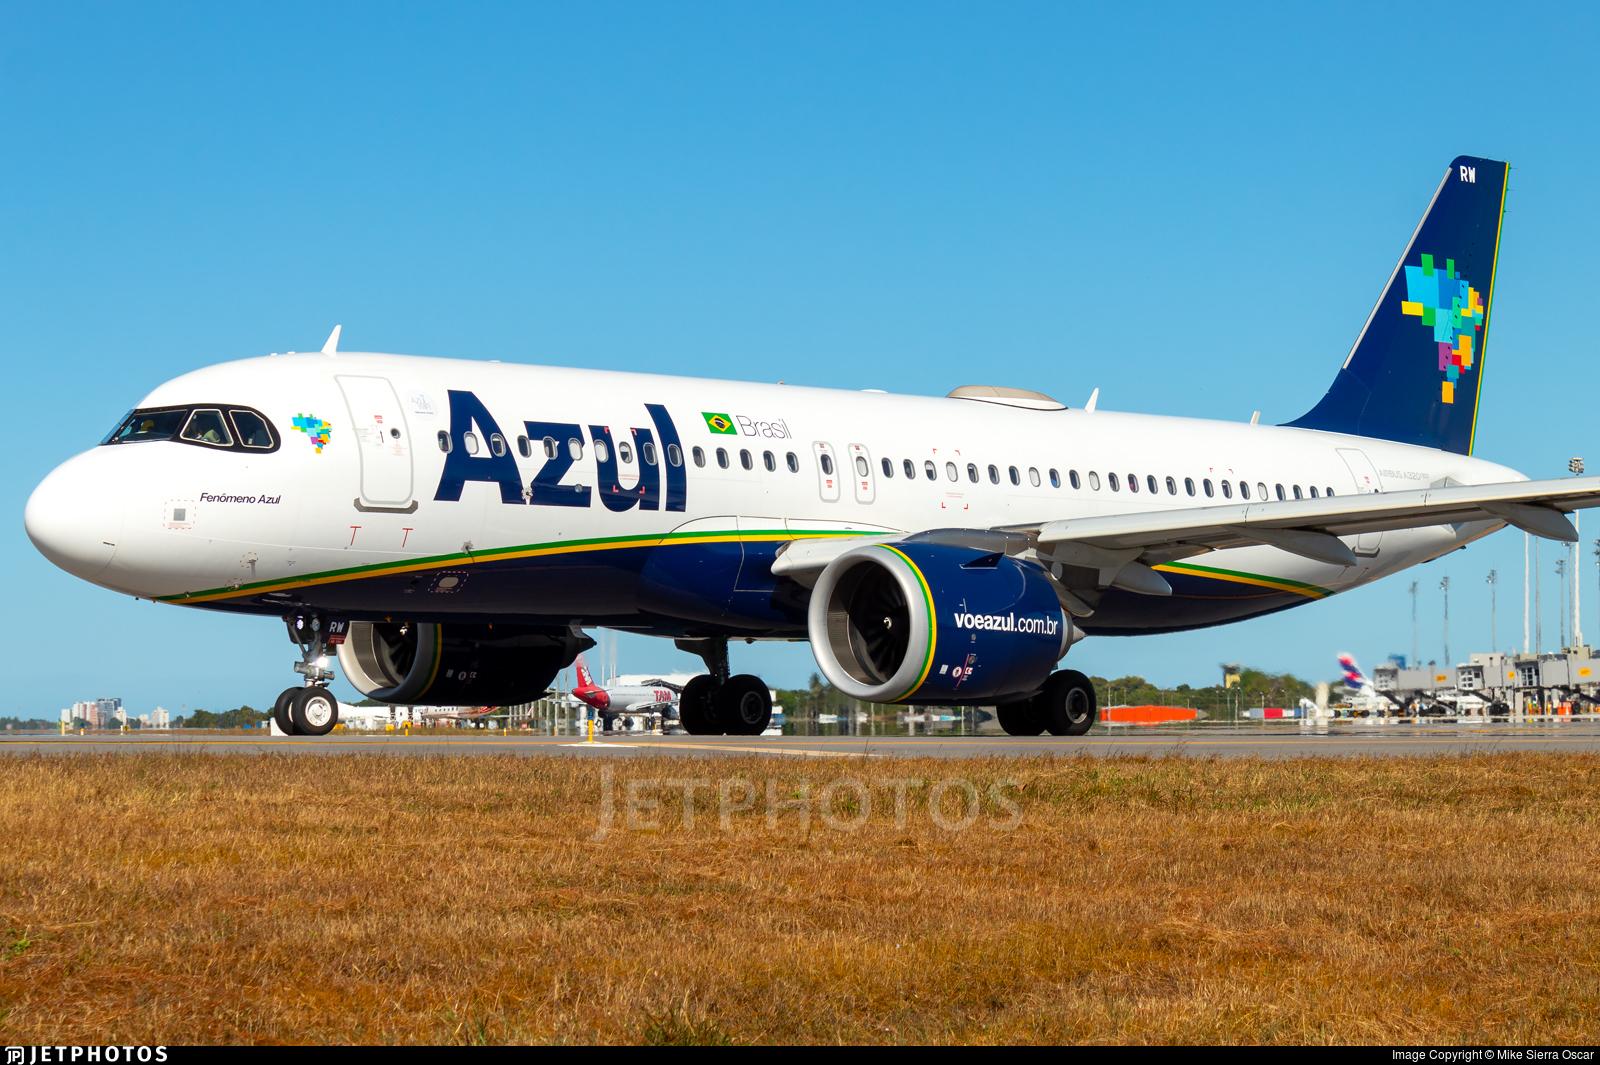 PR-YRW - Airbus A320-251N - Azul Linhas Aéreas Brasileiras